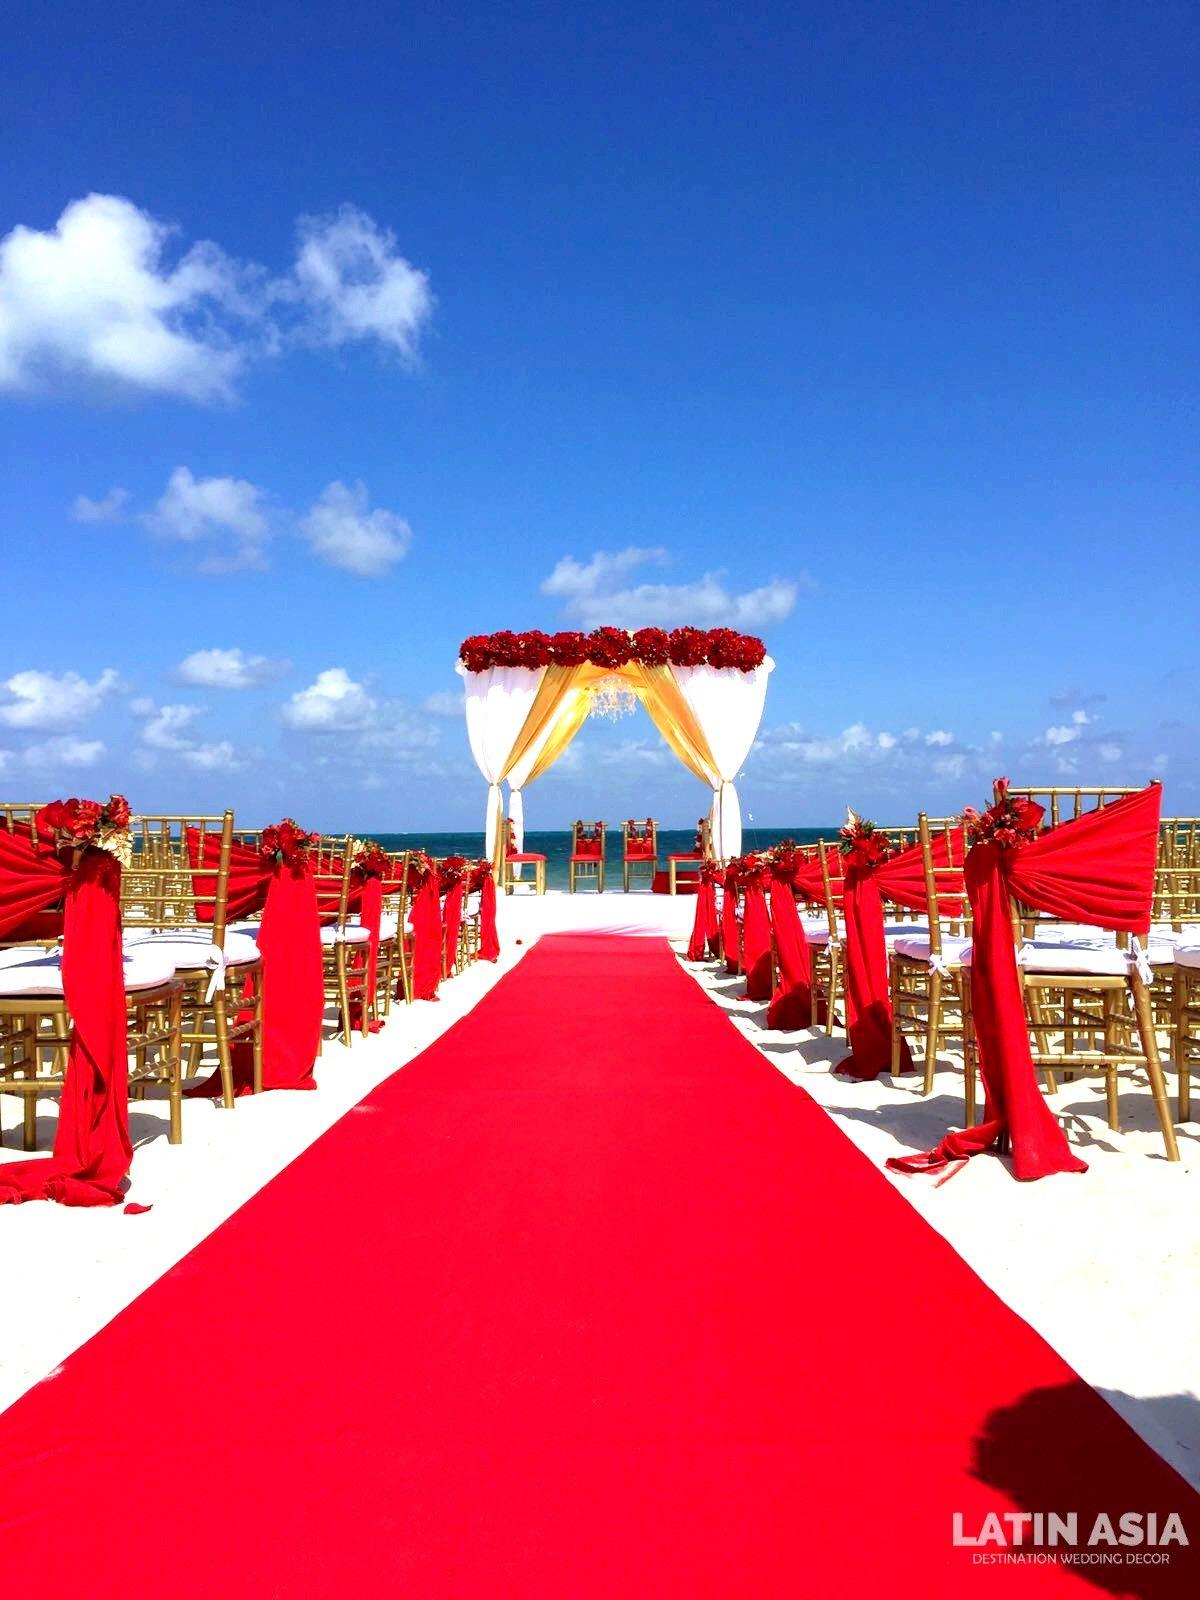 Maroon and blue wedding decor  Pin by Latin Asia Destination wedding decor on Aisle decor  Pinterest